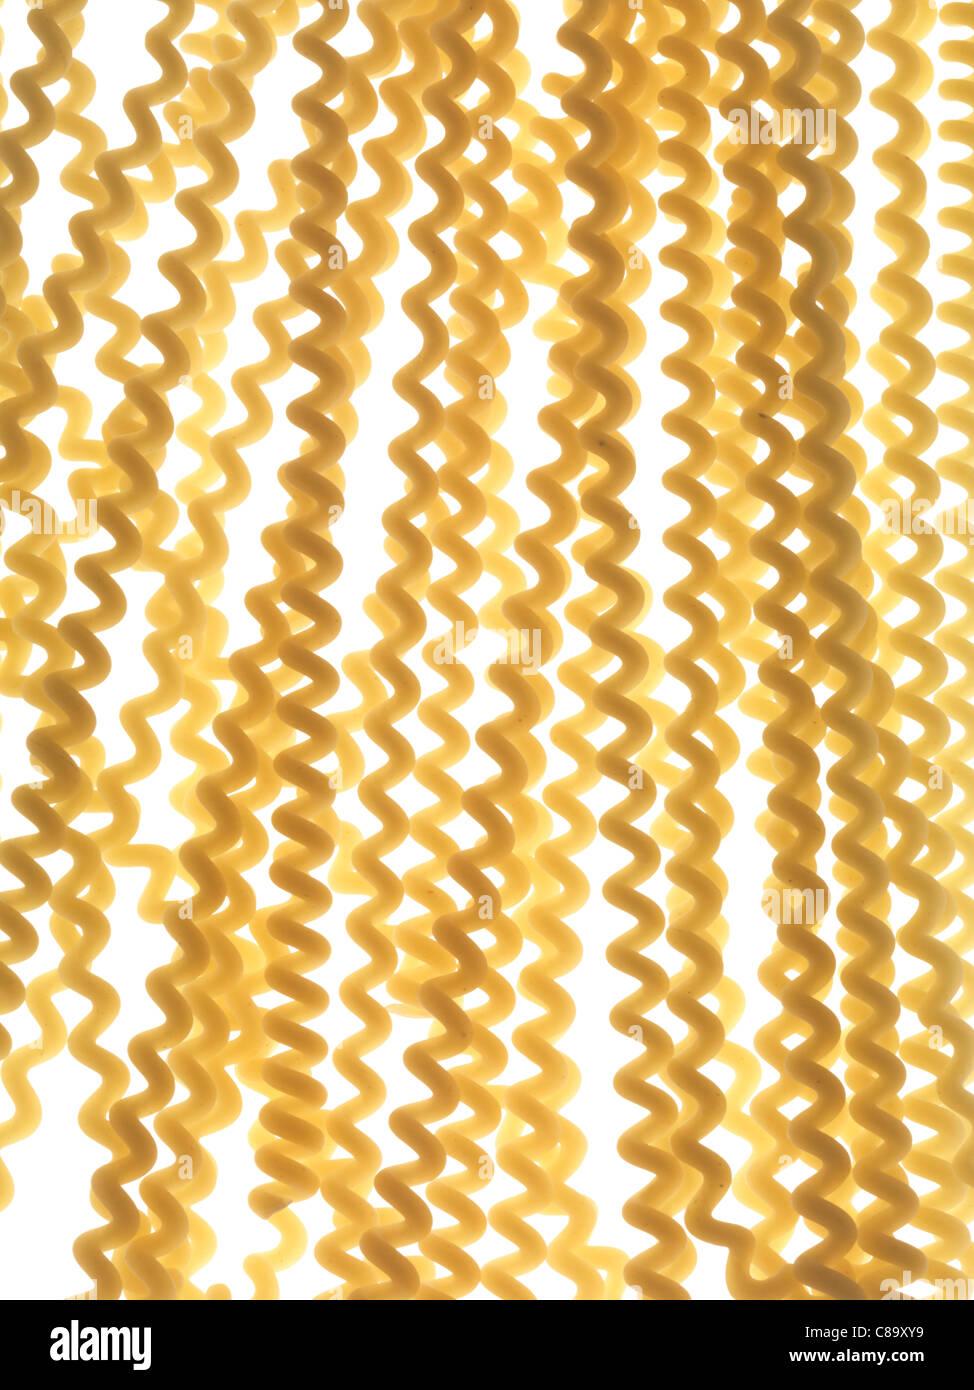 Fusilli bucati pasta - Stock Image